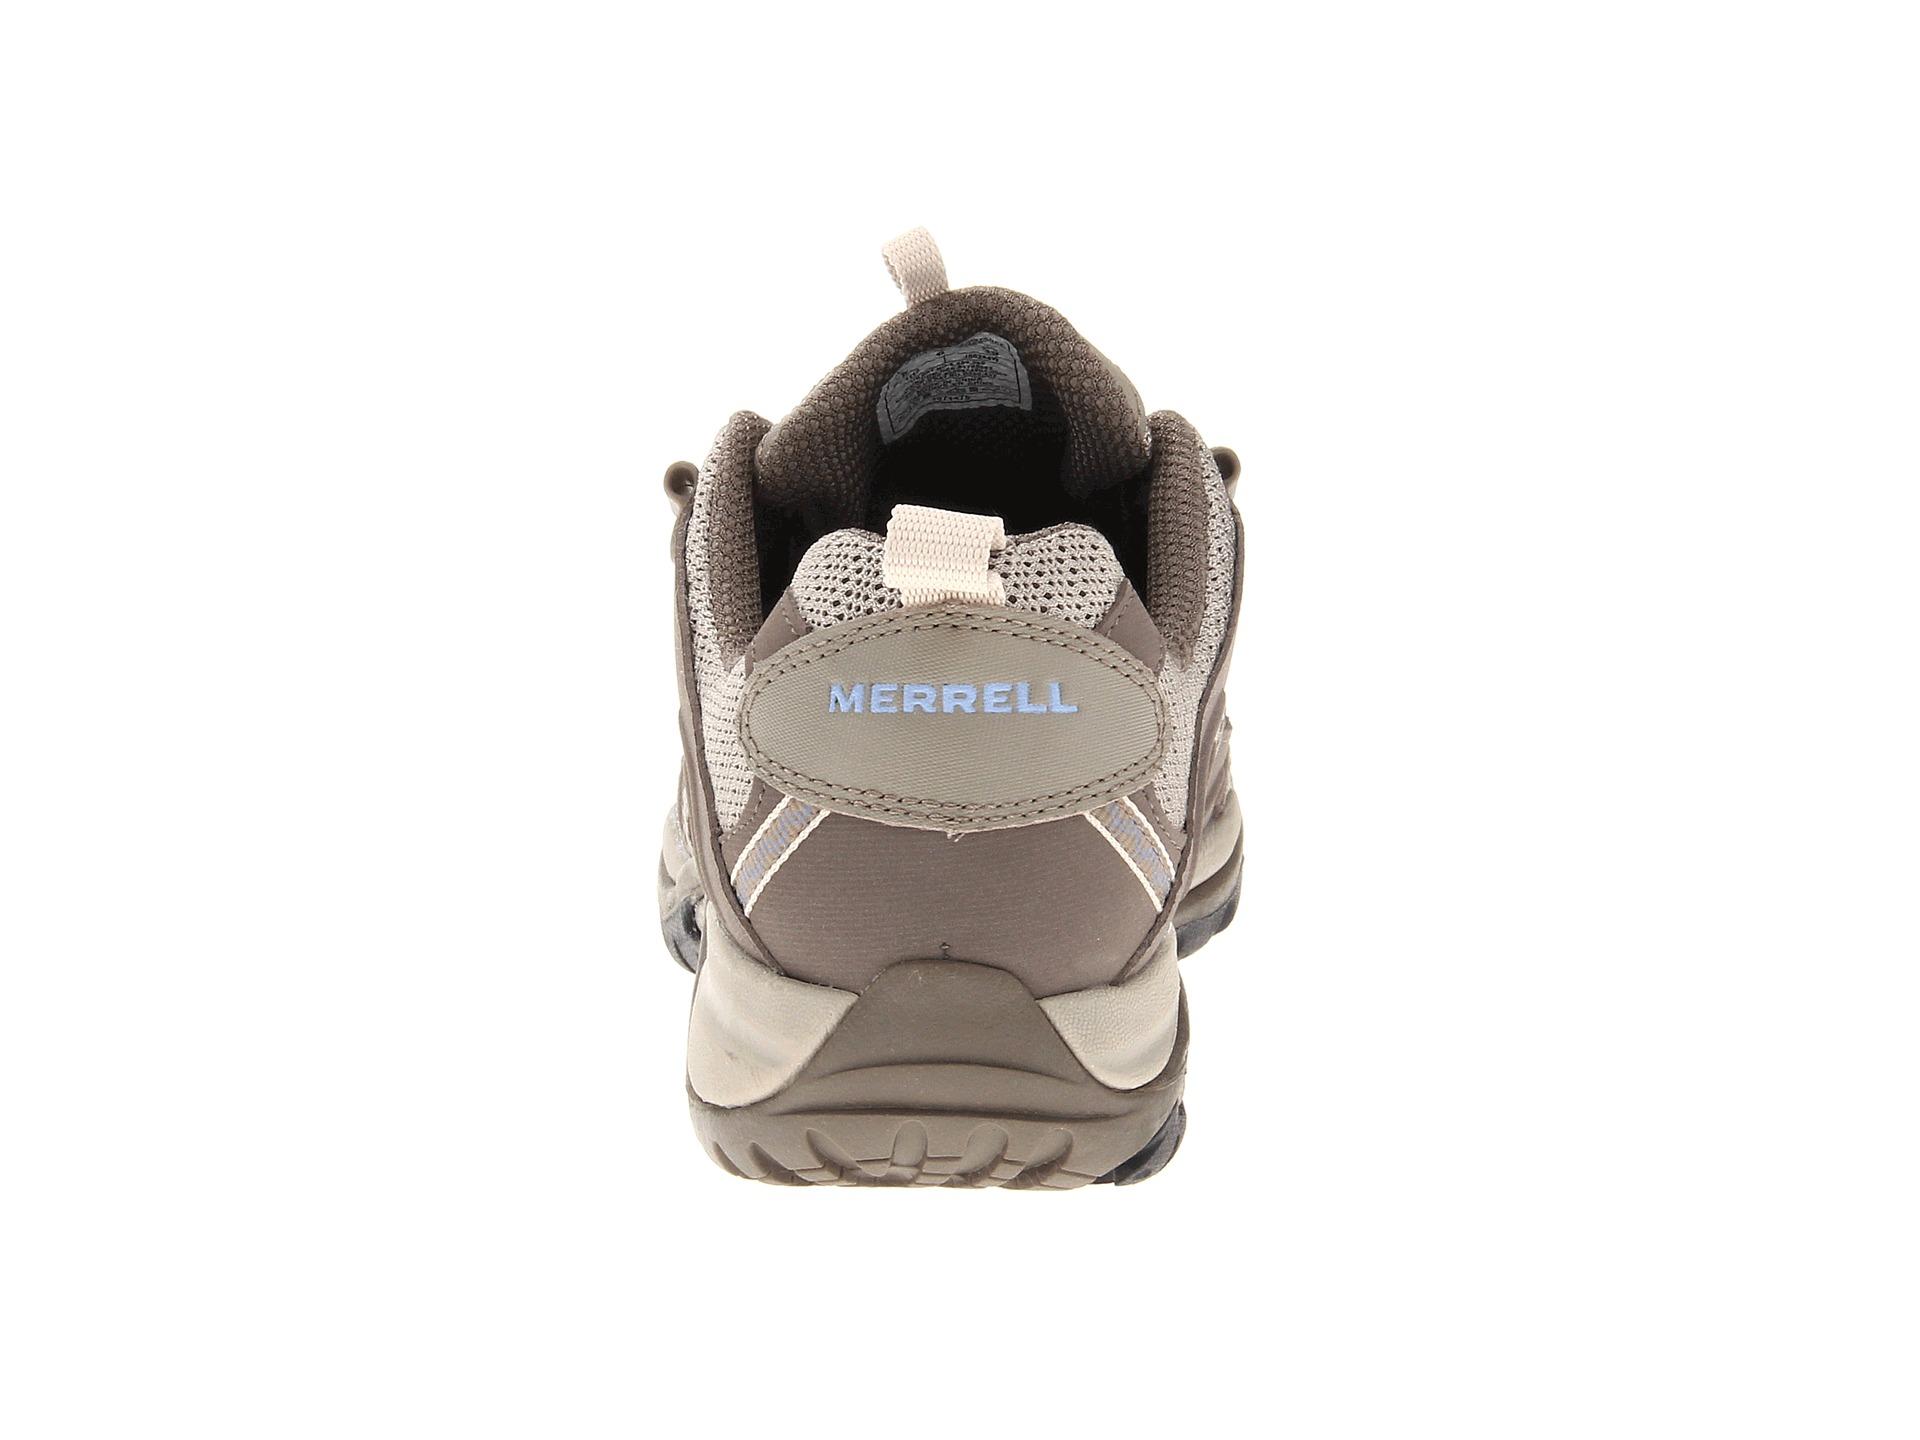 Merrell Siren Sport Light Trail Shoes